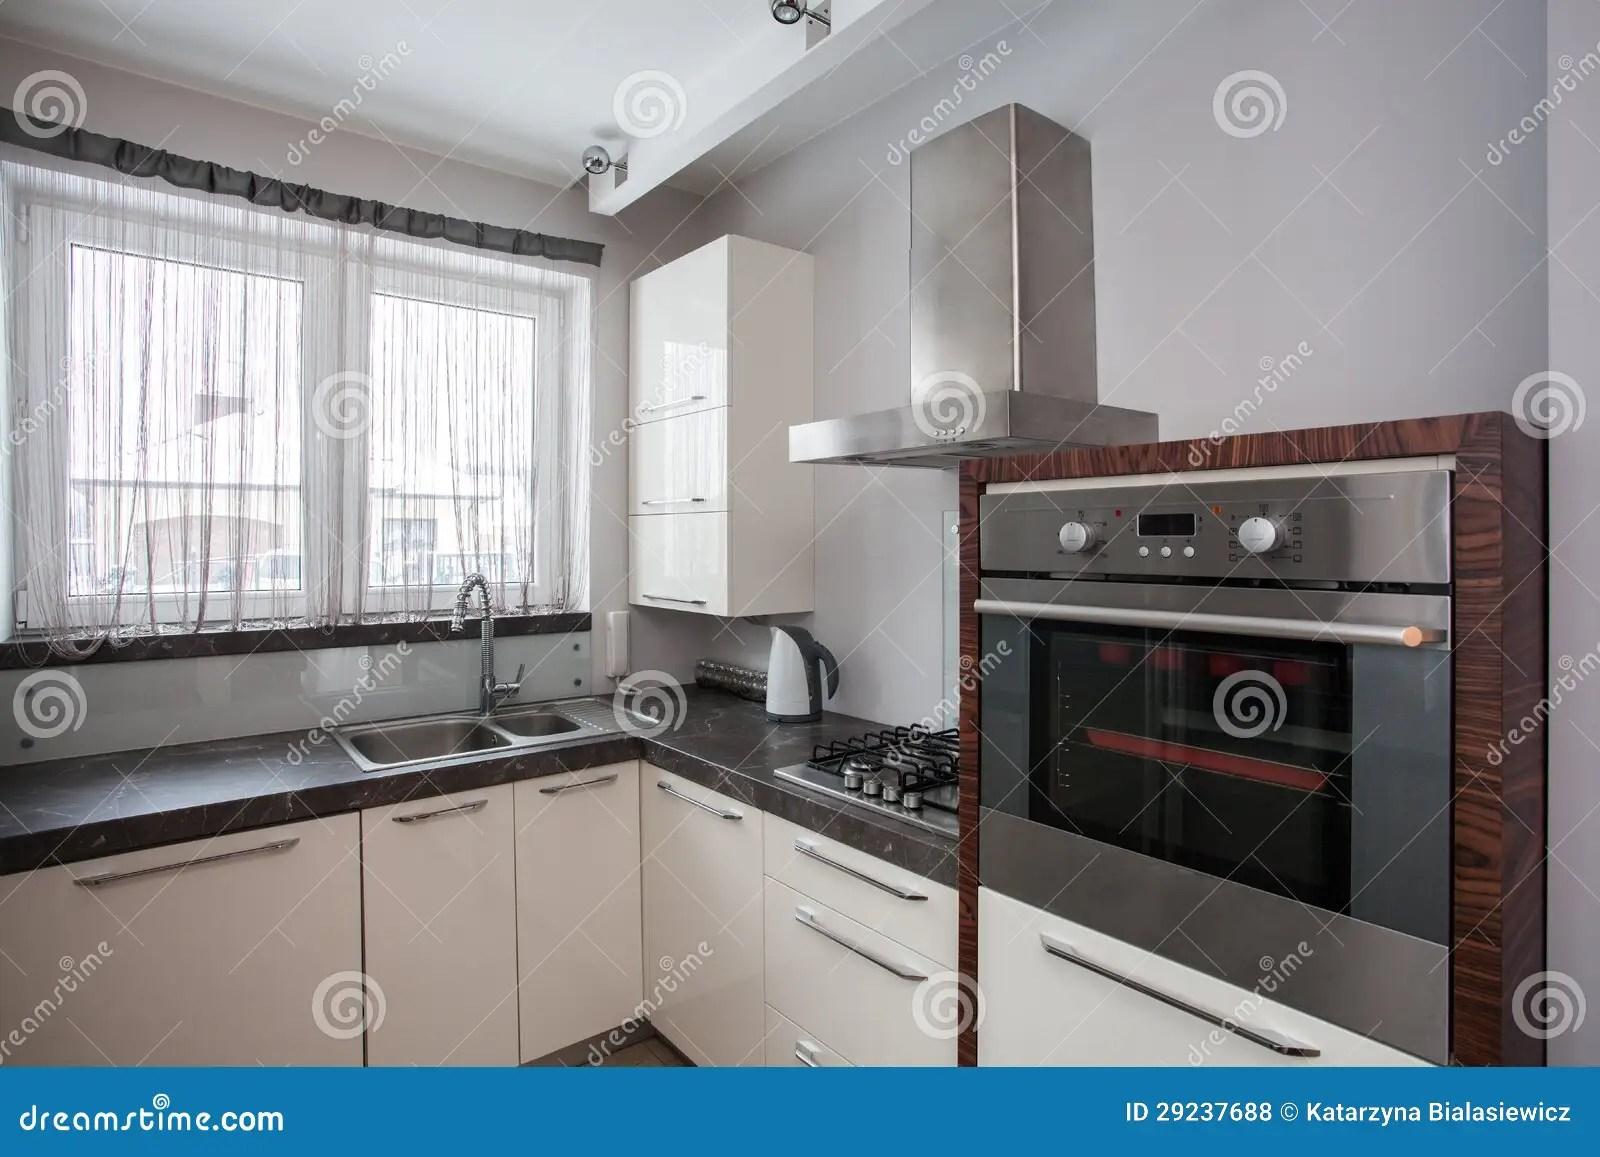 kitchen equipment island top 国家 地区 家庭的厨房设备库存照片 图片包括有厨房 庄园 任何地方 家庭的厨房设备